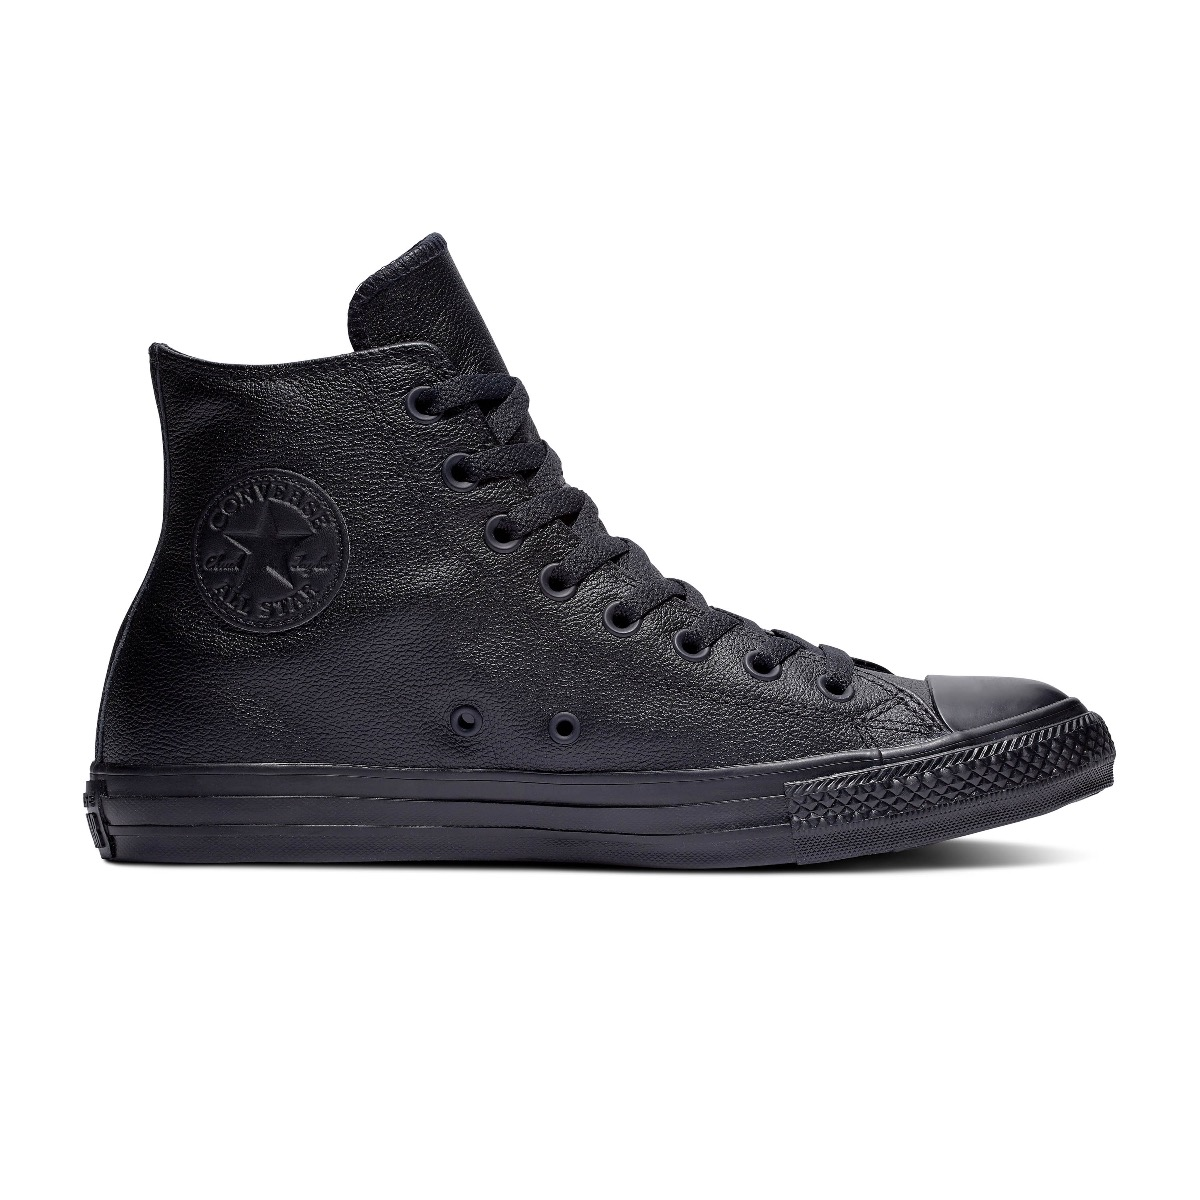 Converse All Stars Leather Hoog 135251C Zwart maat